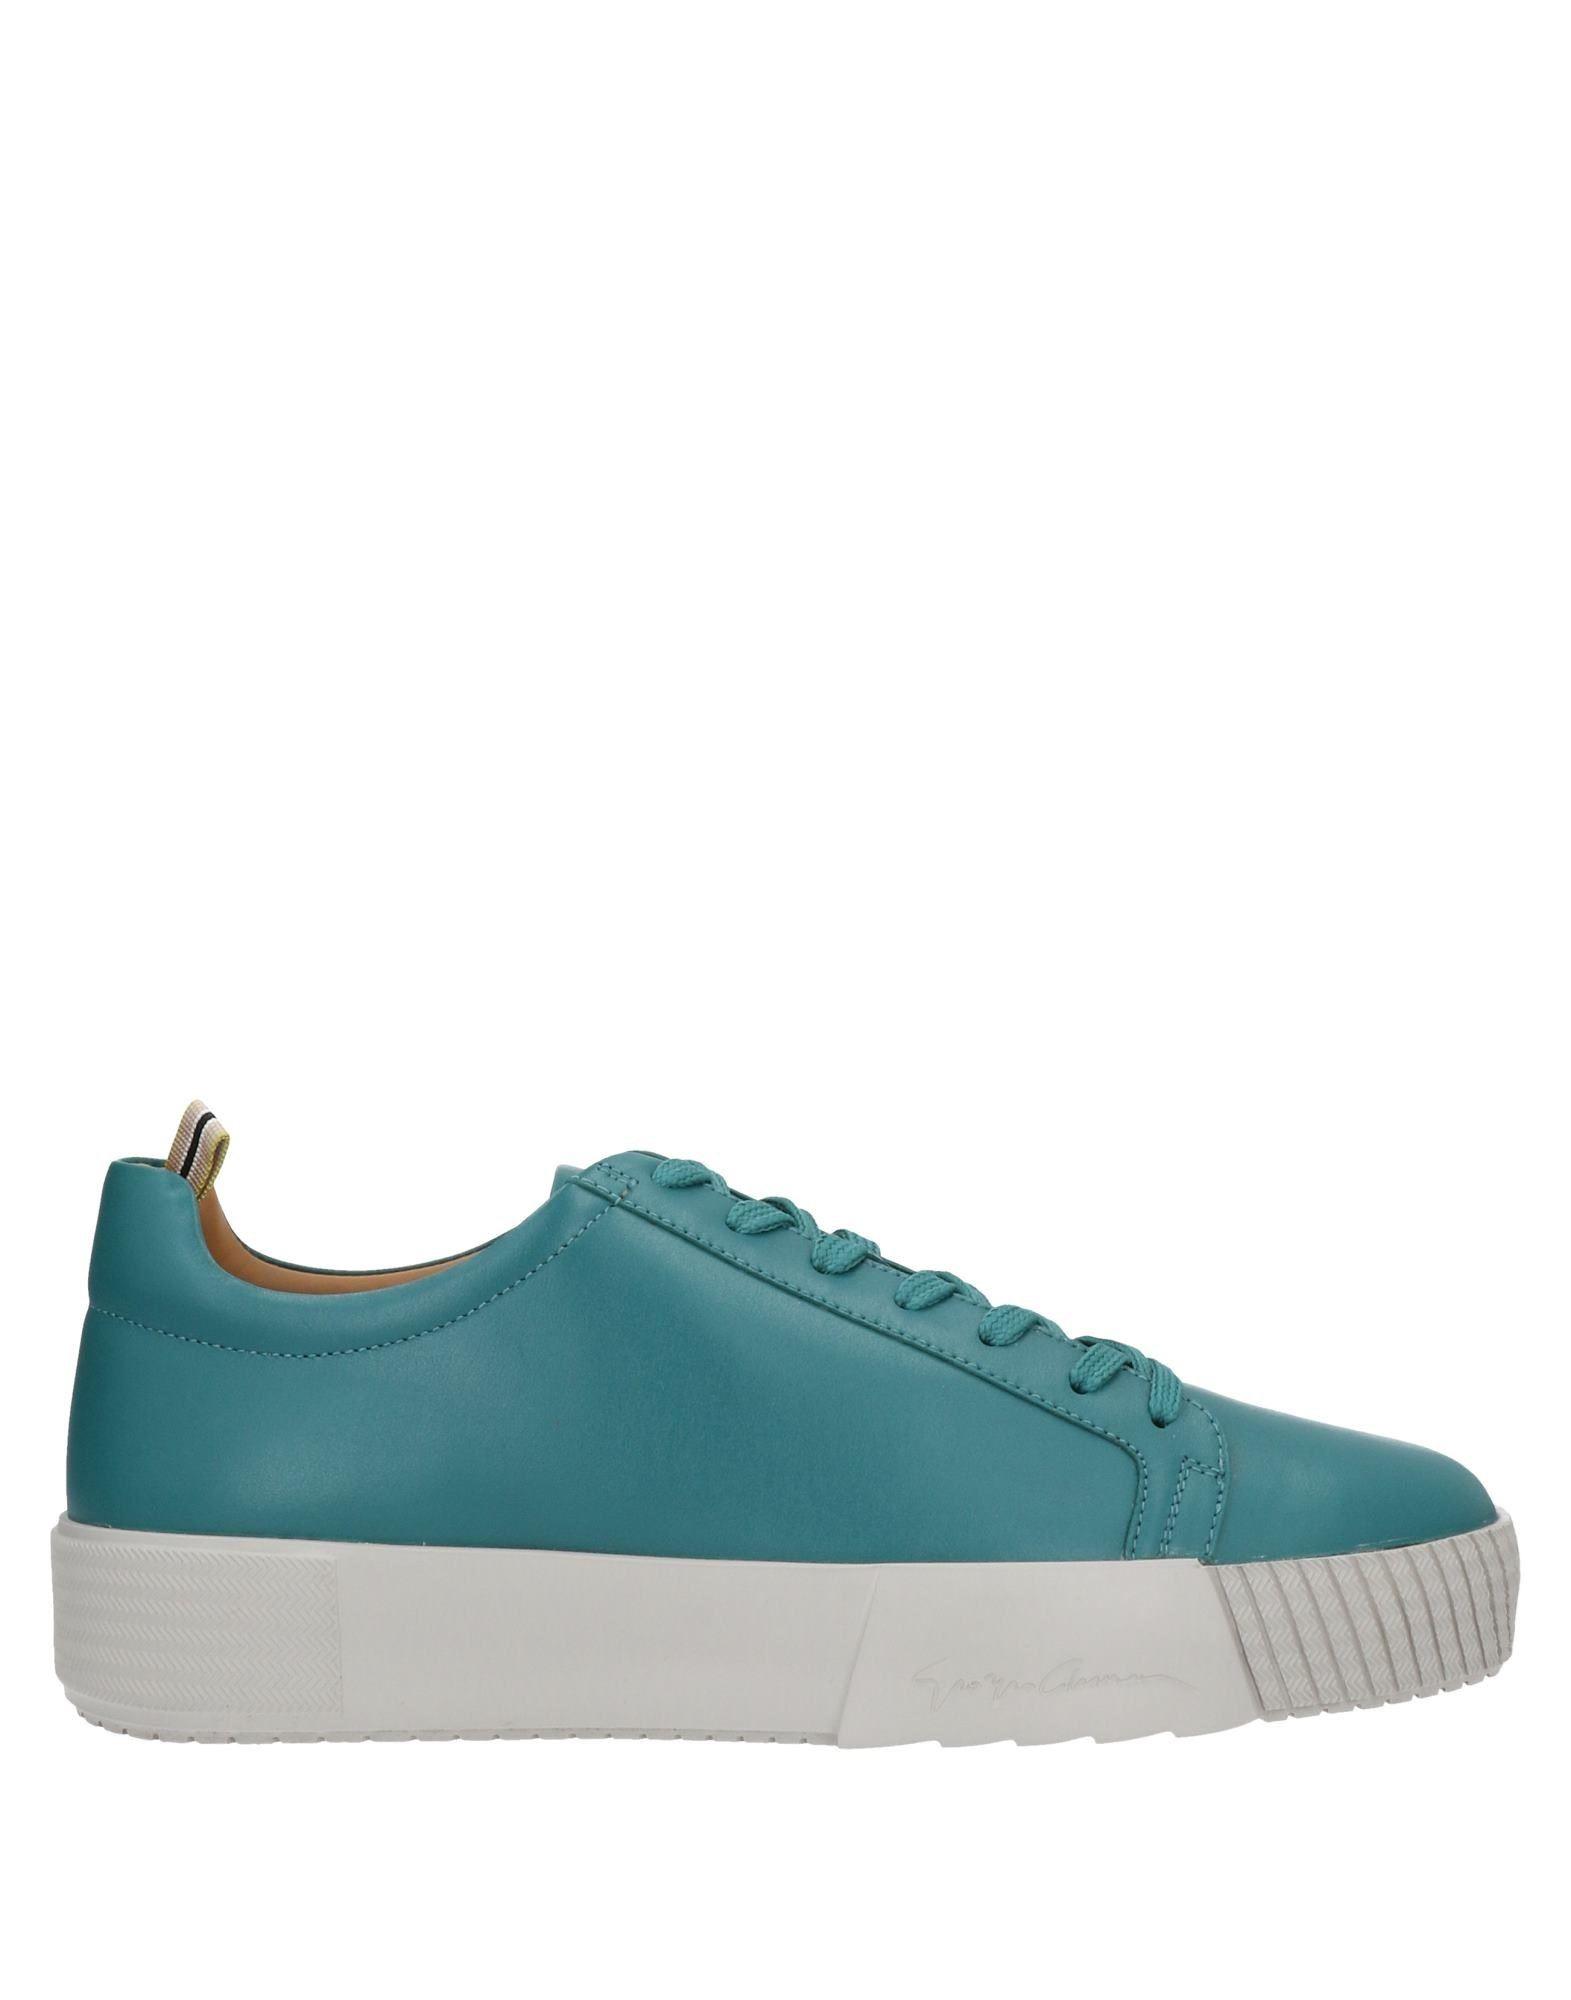 GIORGIO ARMANI Low-tops & sneakers - Item 17006419